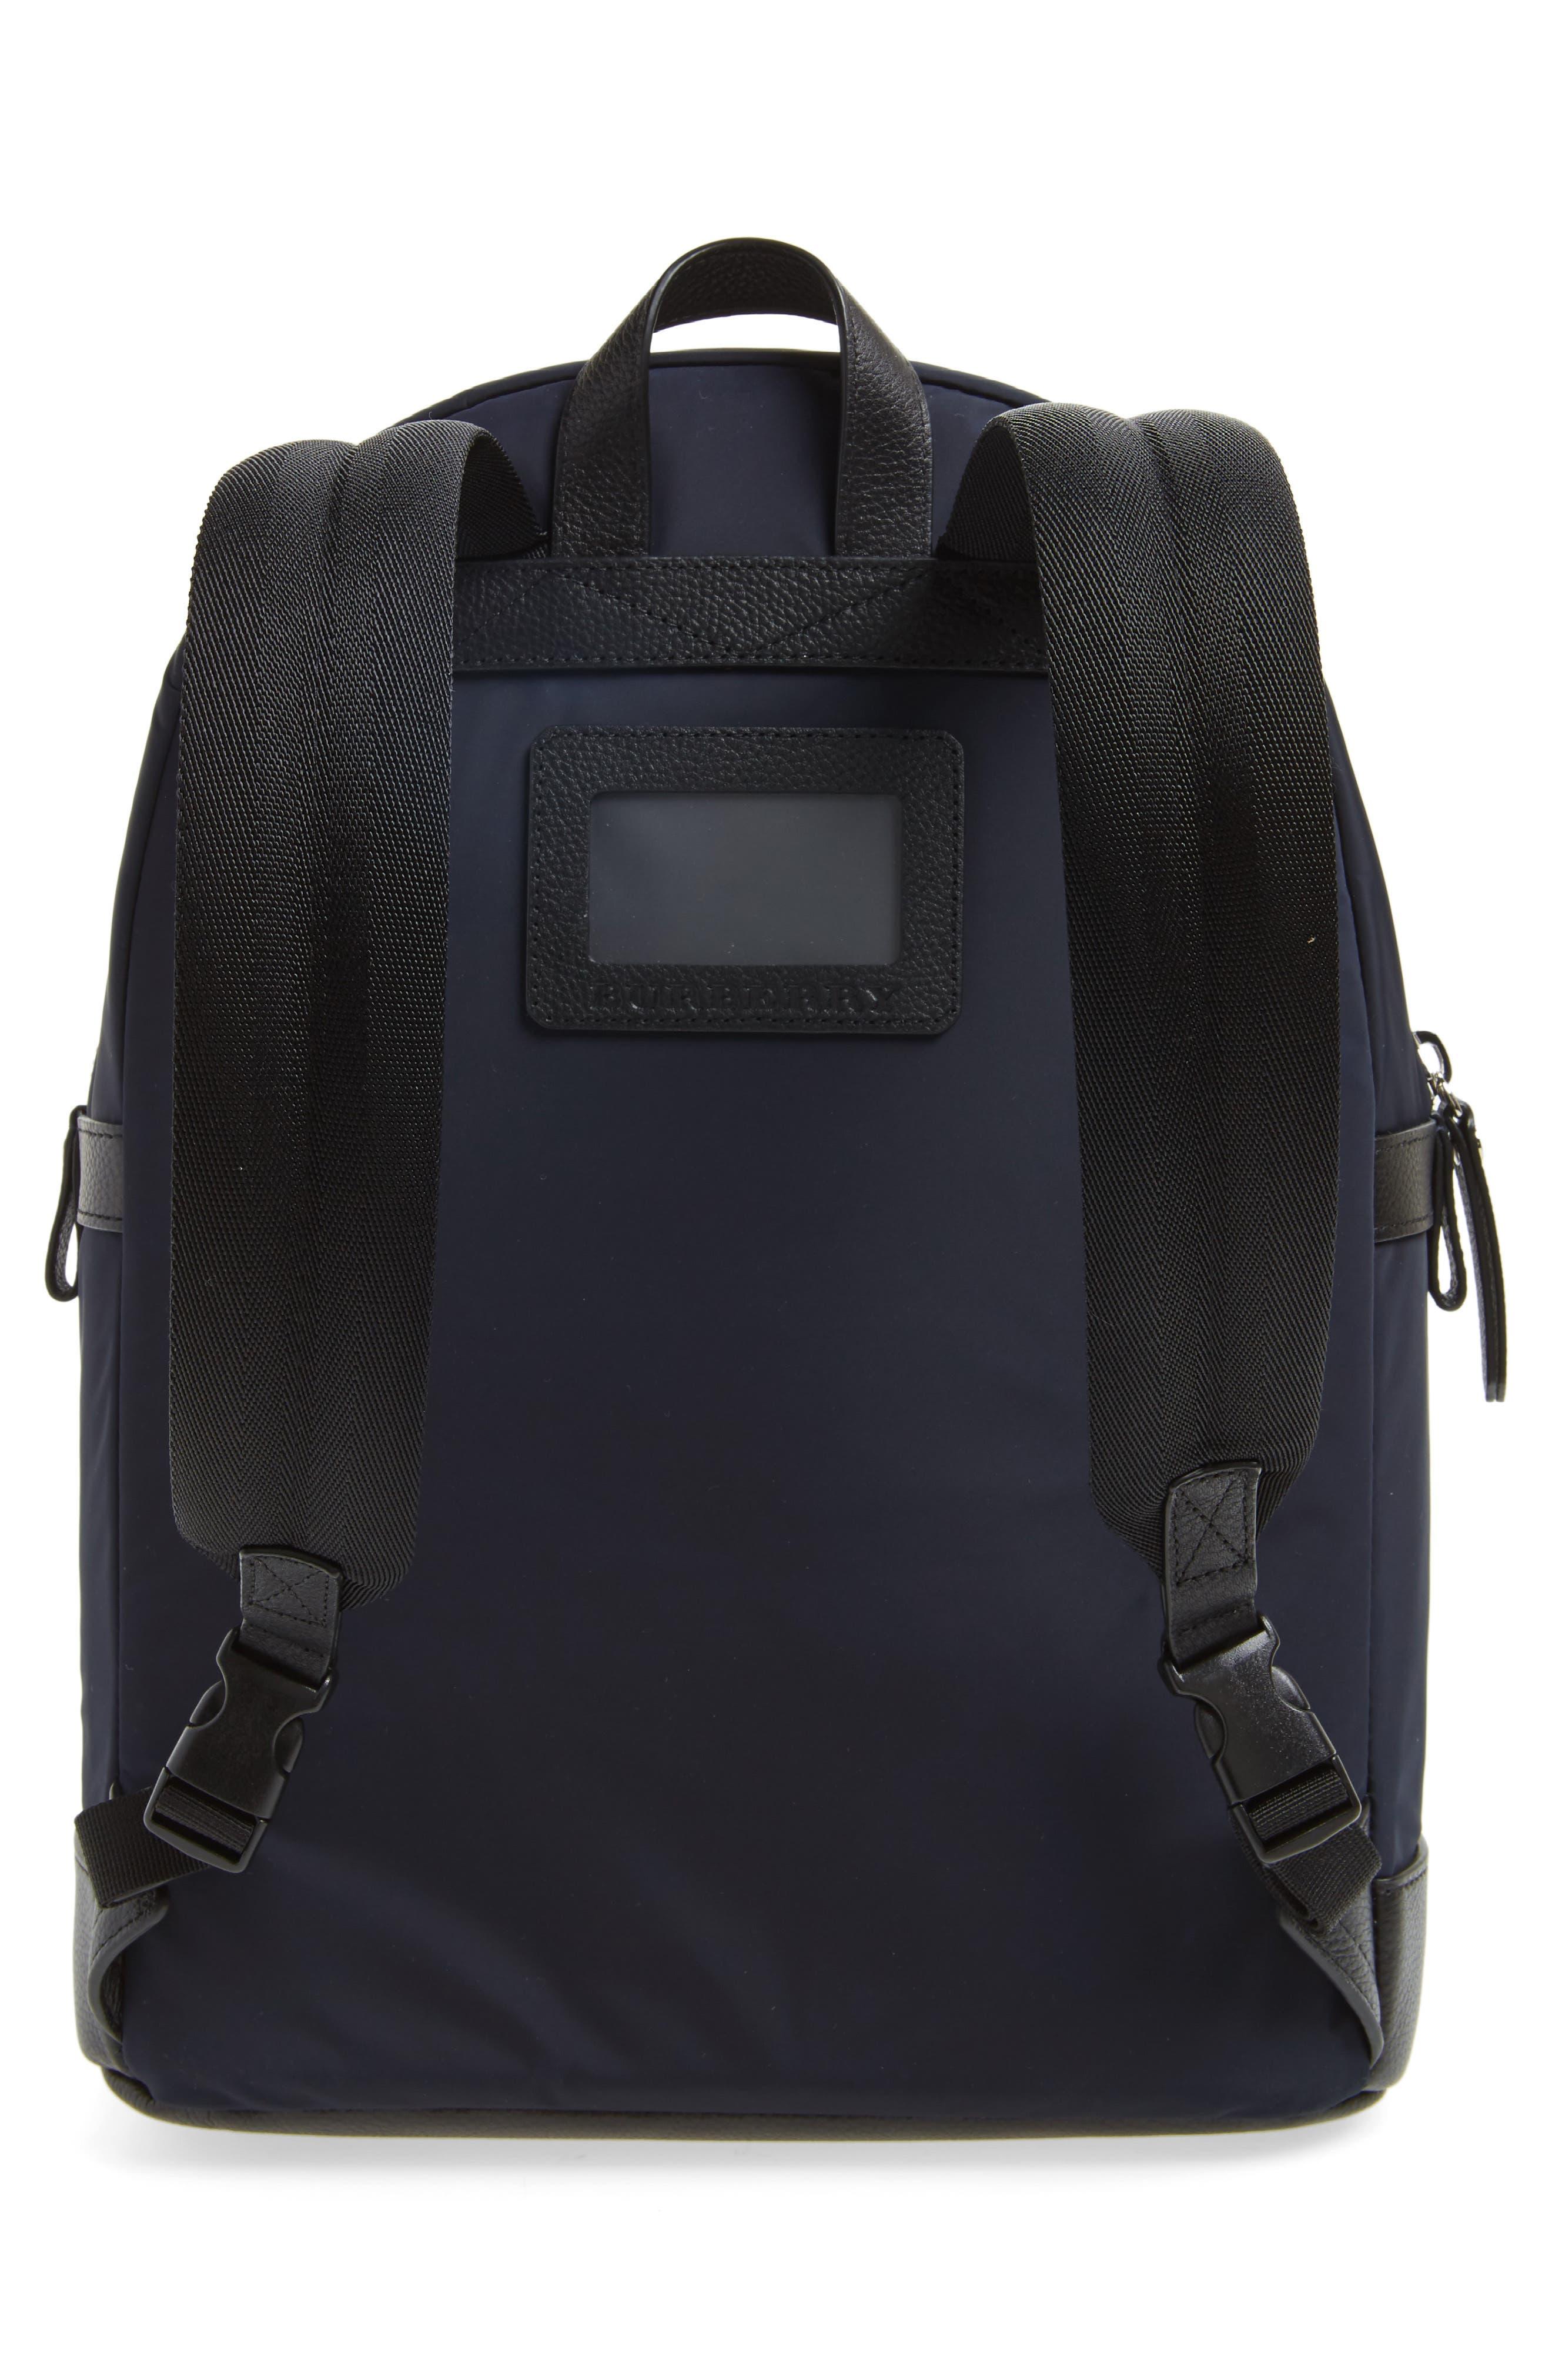 Nico London Backpack,                             Alternate thumbnail 2, color,